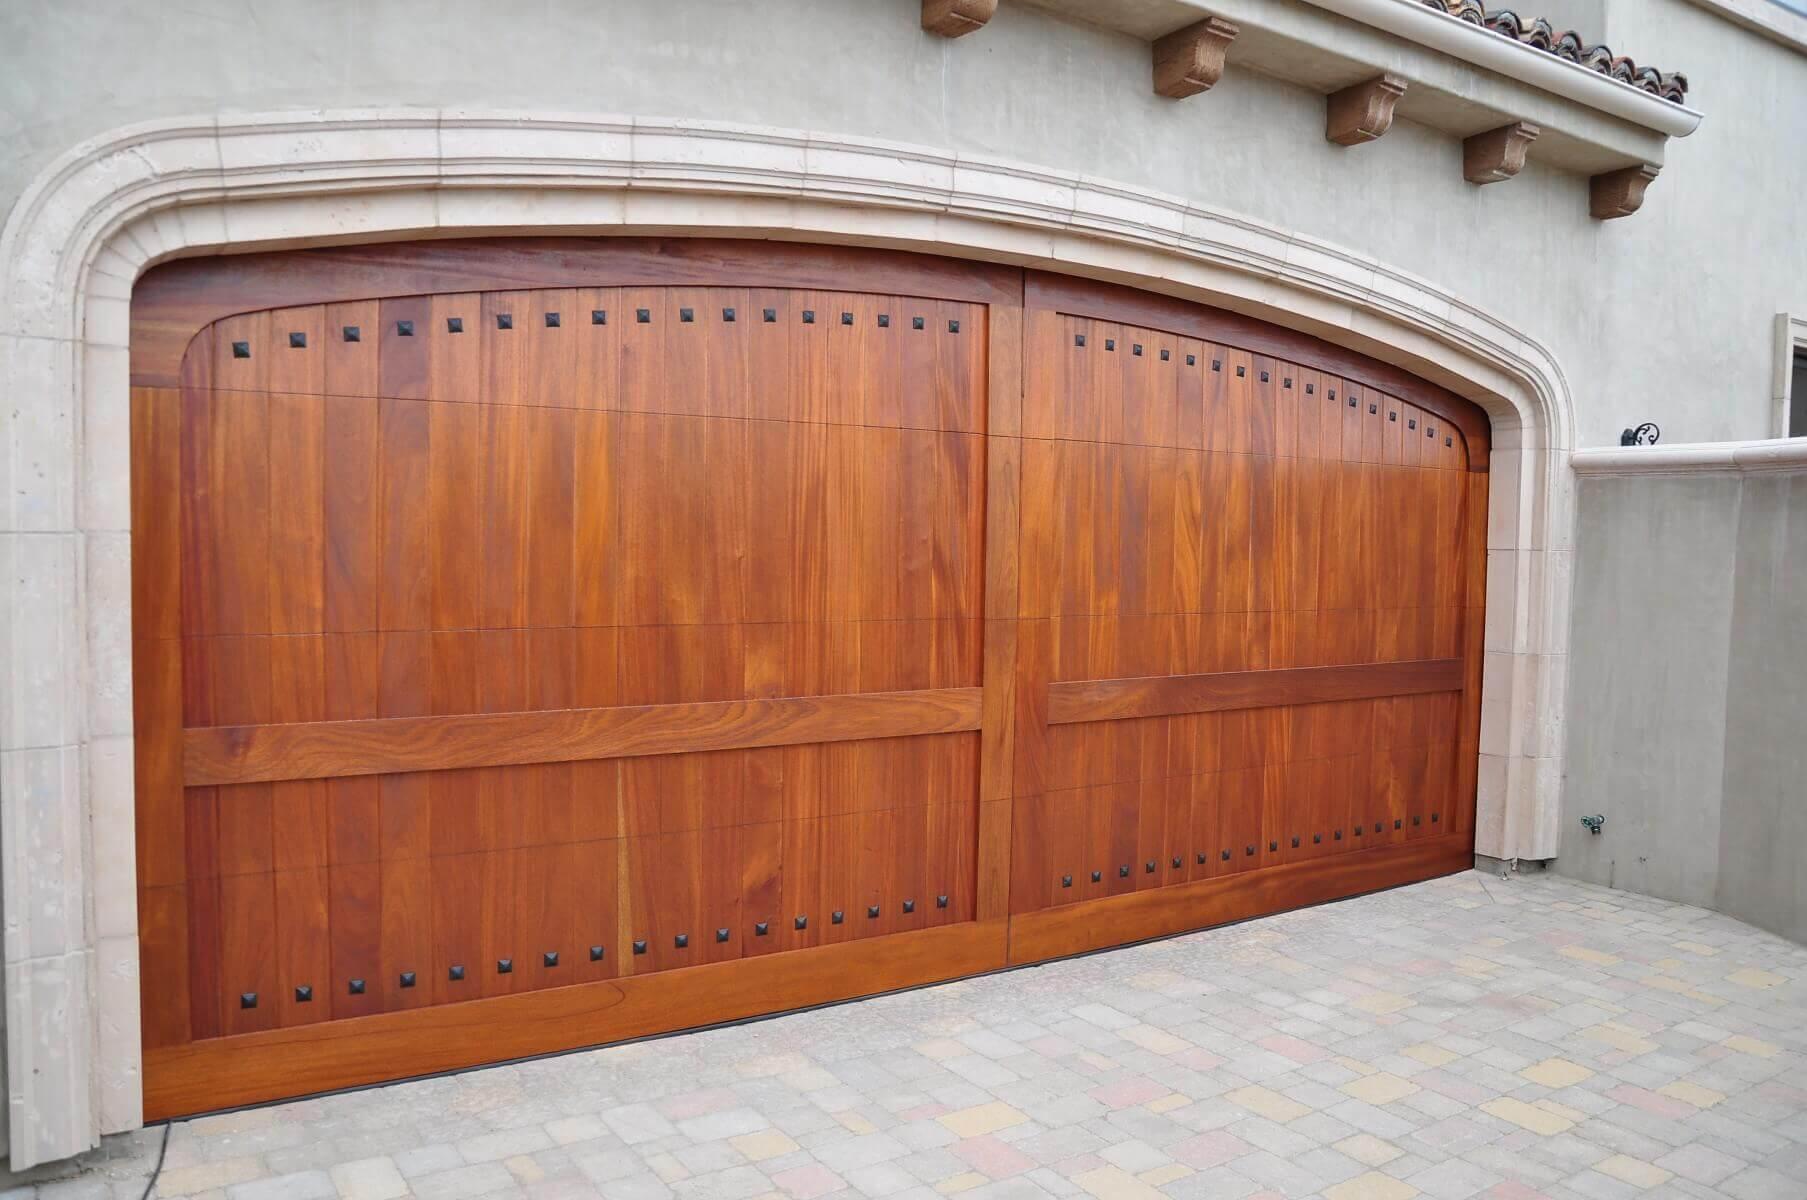 After Santa Rosa Valley Camarillo Garage Door Replacement (8)